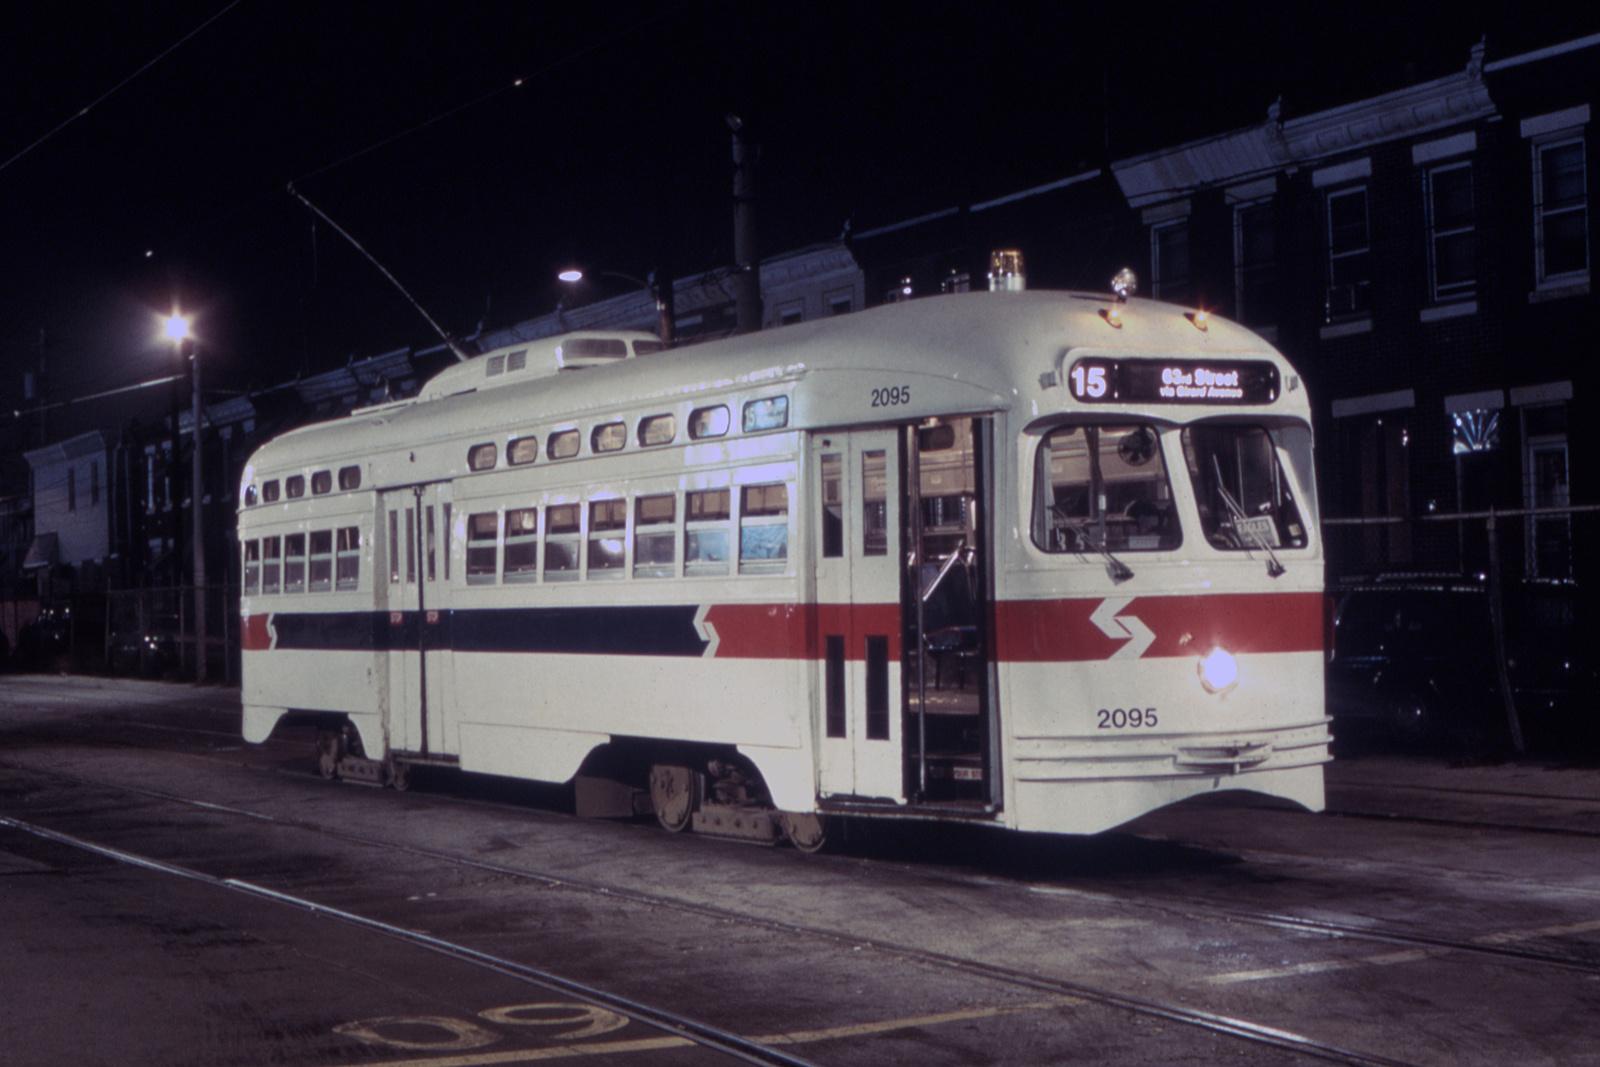 (574k, 1600x1067)<br><b>Country:</b> United States<br><b>City:</b> Philadelphia, PA<br><b>System:</b> SEPTA (or Predecessor)<br><b>Line:</b> Rt. 15-Girard<br><b>Location:</b> Richmond/Westmoreland<br><b>Car:</b> PTC/SEPTA Postwar All-electric PCC (St.Louis, 1948) 2095 <br><b>Photo by:</b> Glenn L. Rowe<br><b>Collection of:</b> David Pirmann<br><b>Date:</b> 9/4/1992<br><b>Viewed (this week/total):</b> 0 / 12977